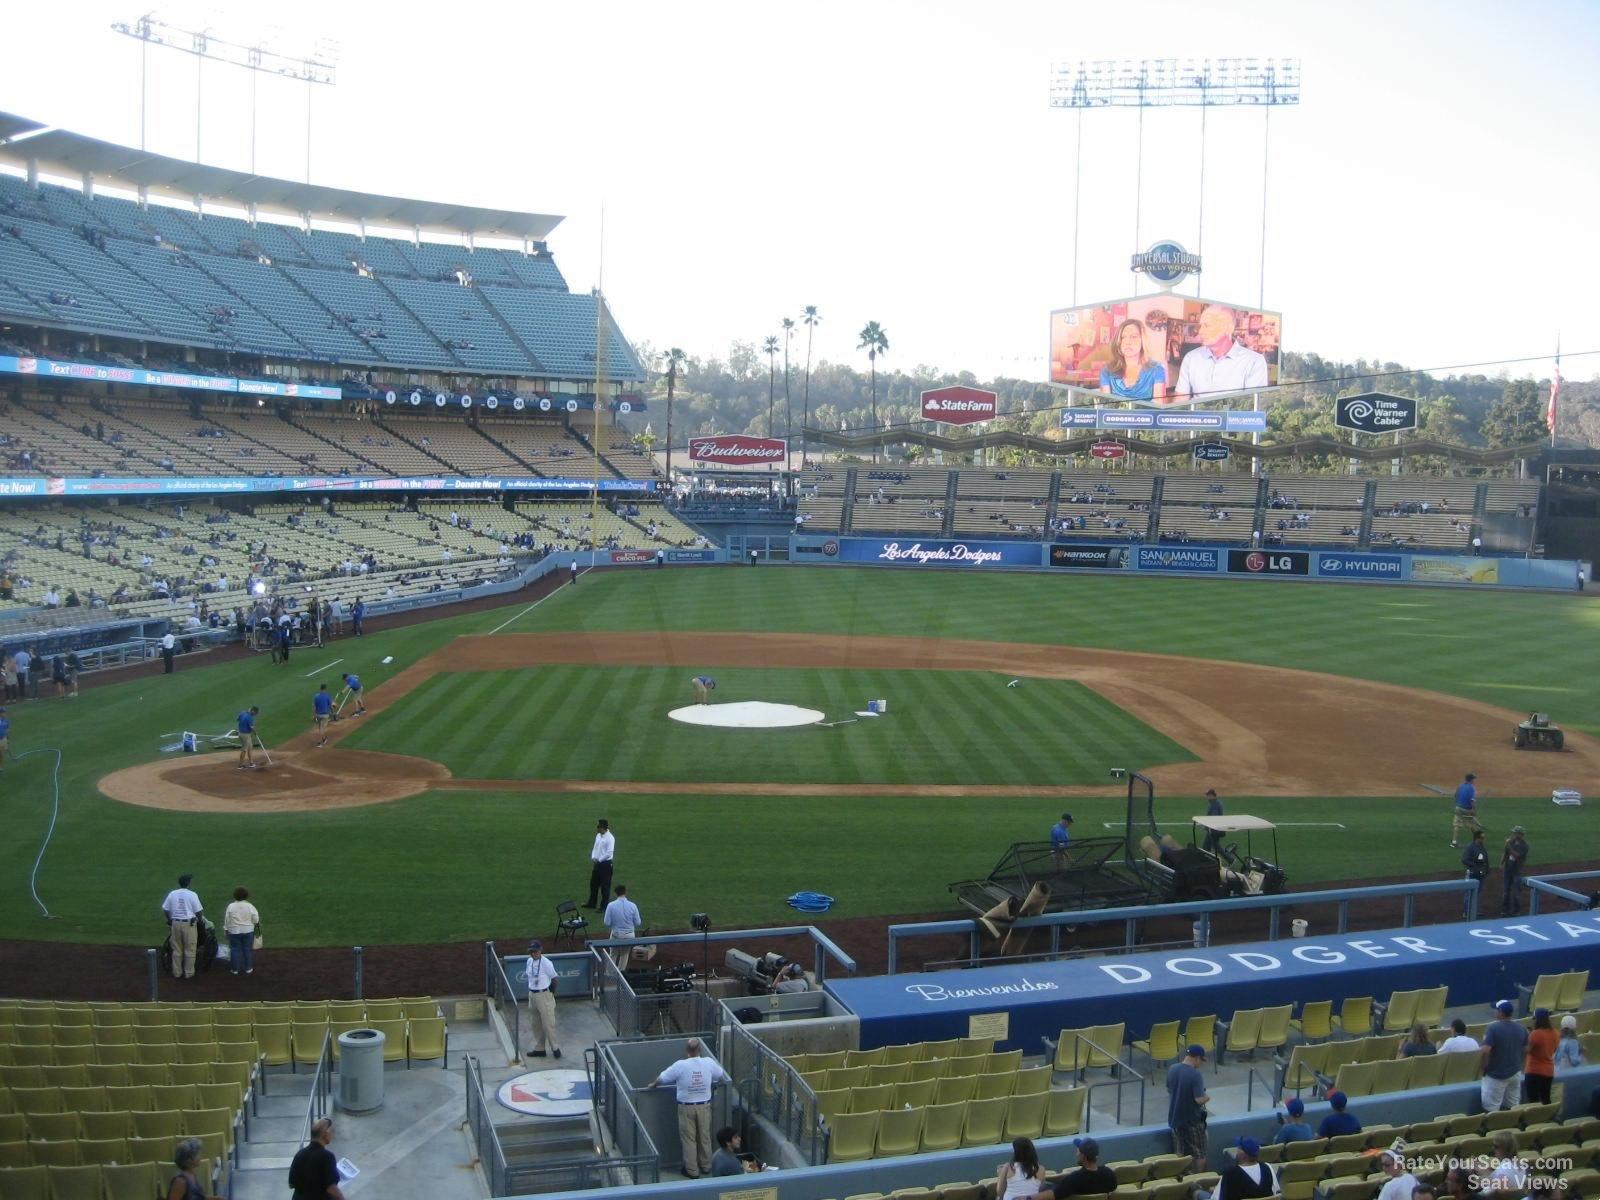 Dodger Stadium Section 126 - RateYourSeats.com